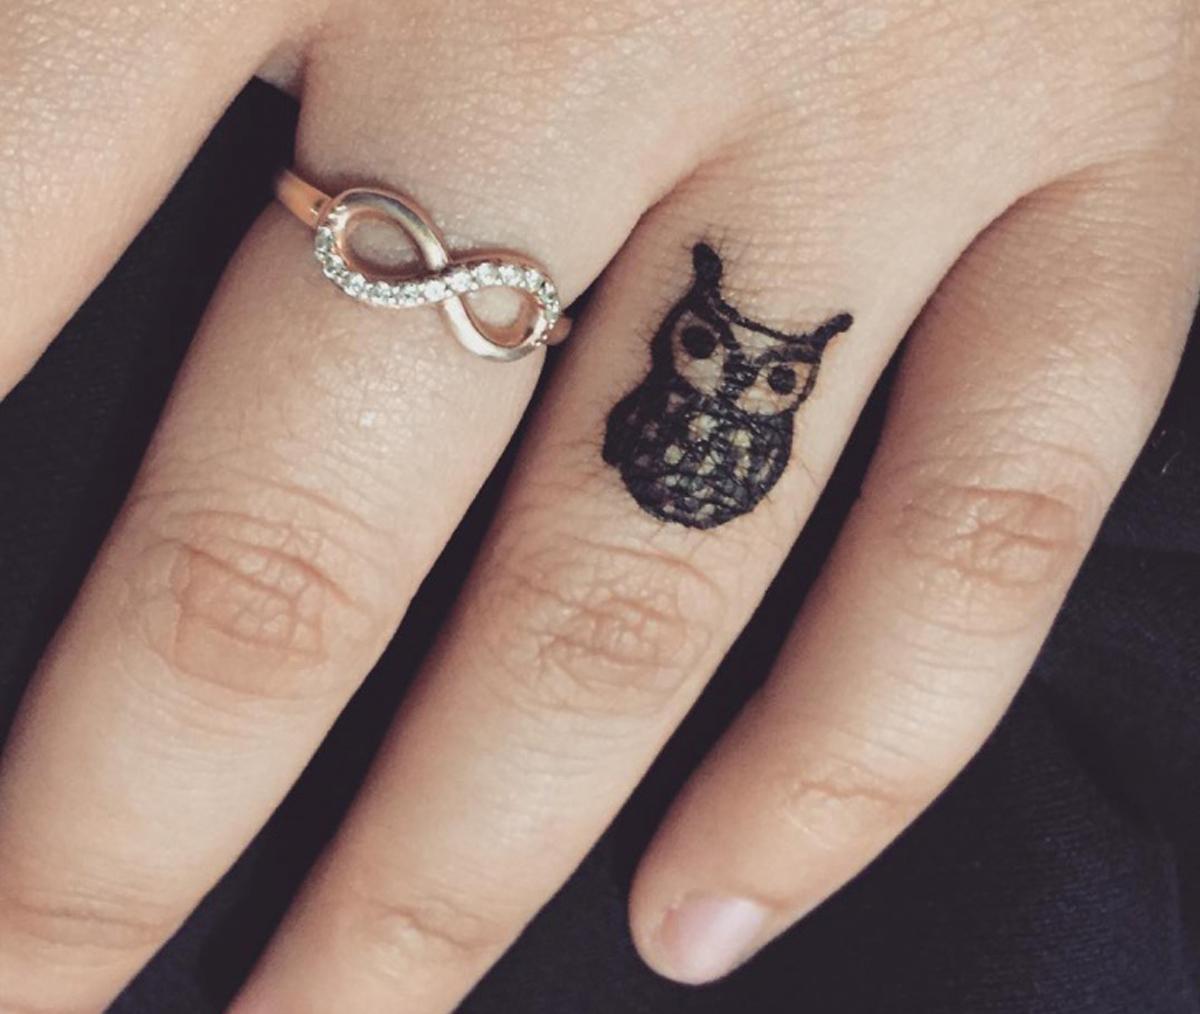 Small-Owl-Tattoo-on-Finger-designtrends.com